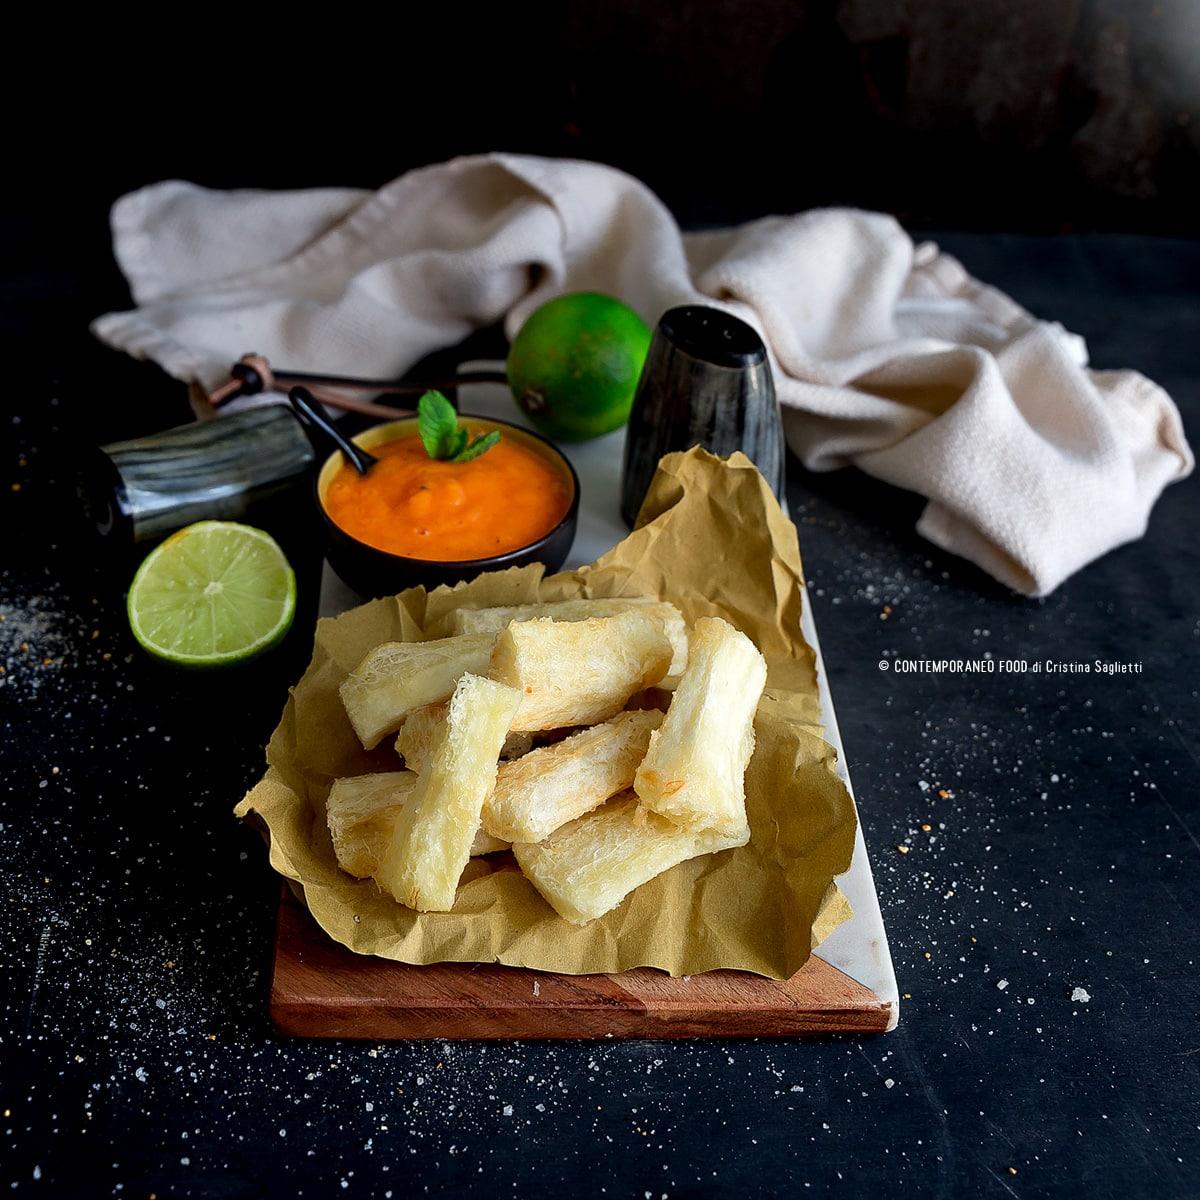 manioca-fritta-con-coulis-di-papaya-lime-ricetta-superfood-2018-aperitivo-facile-contemporaneo-food